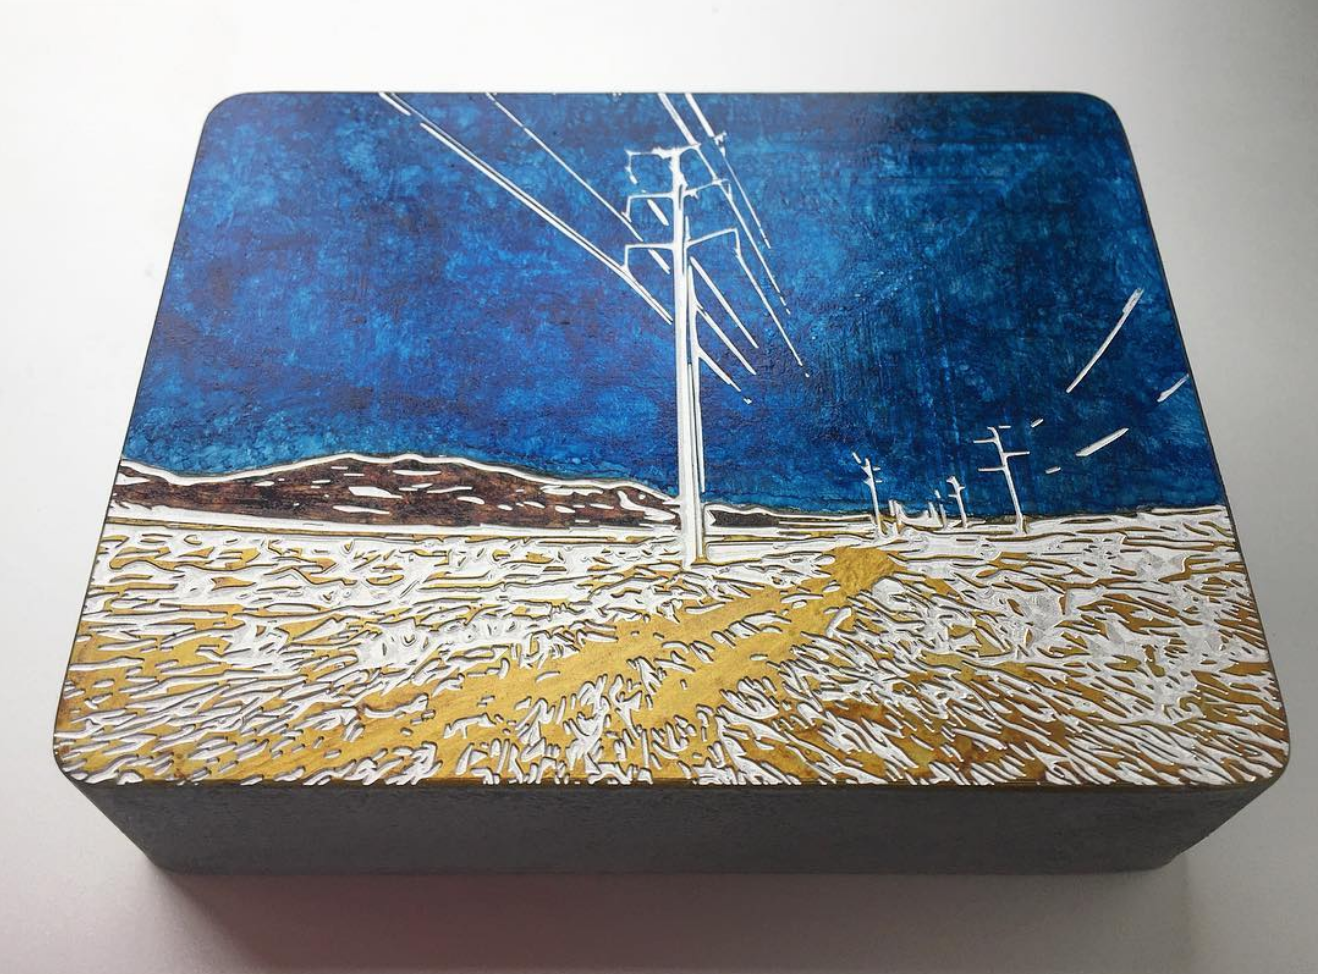 Highway scene engraved by Eddie Serratos.